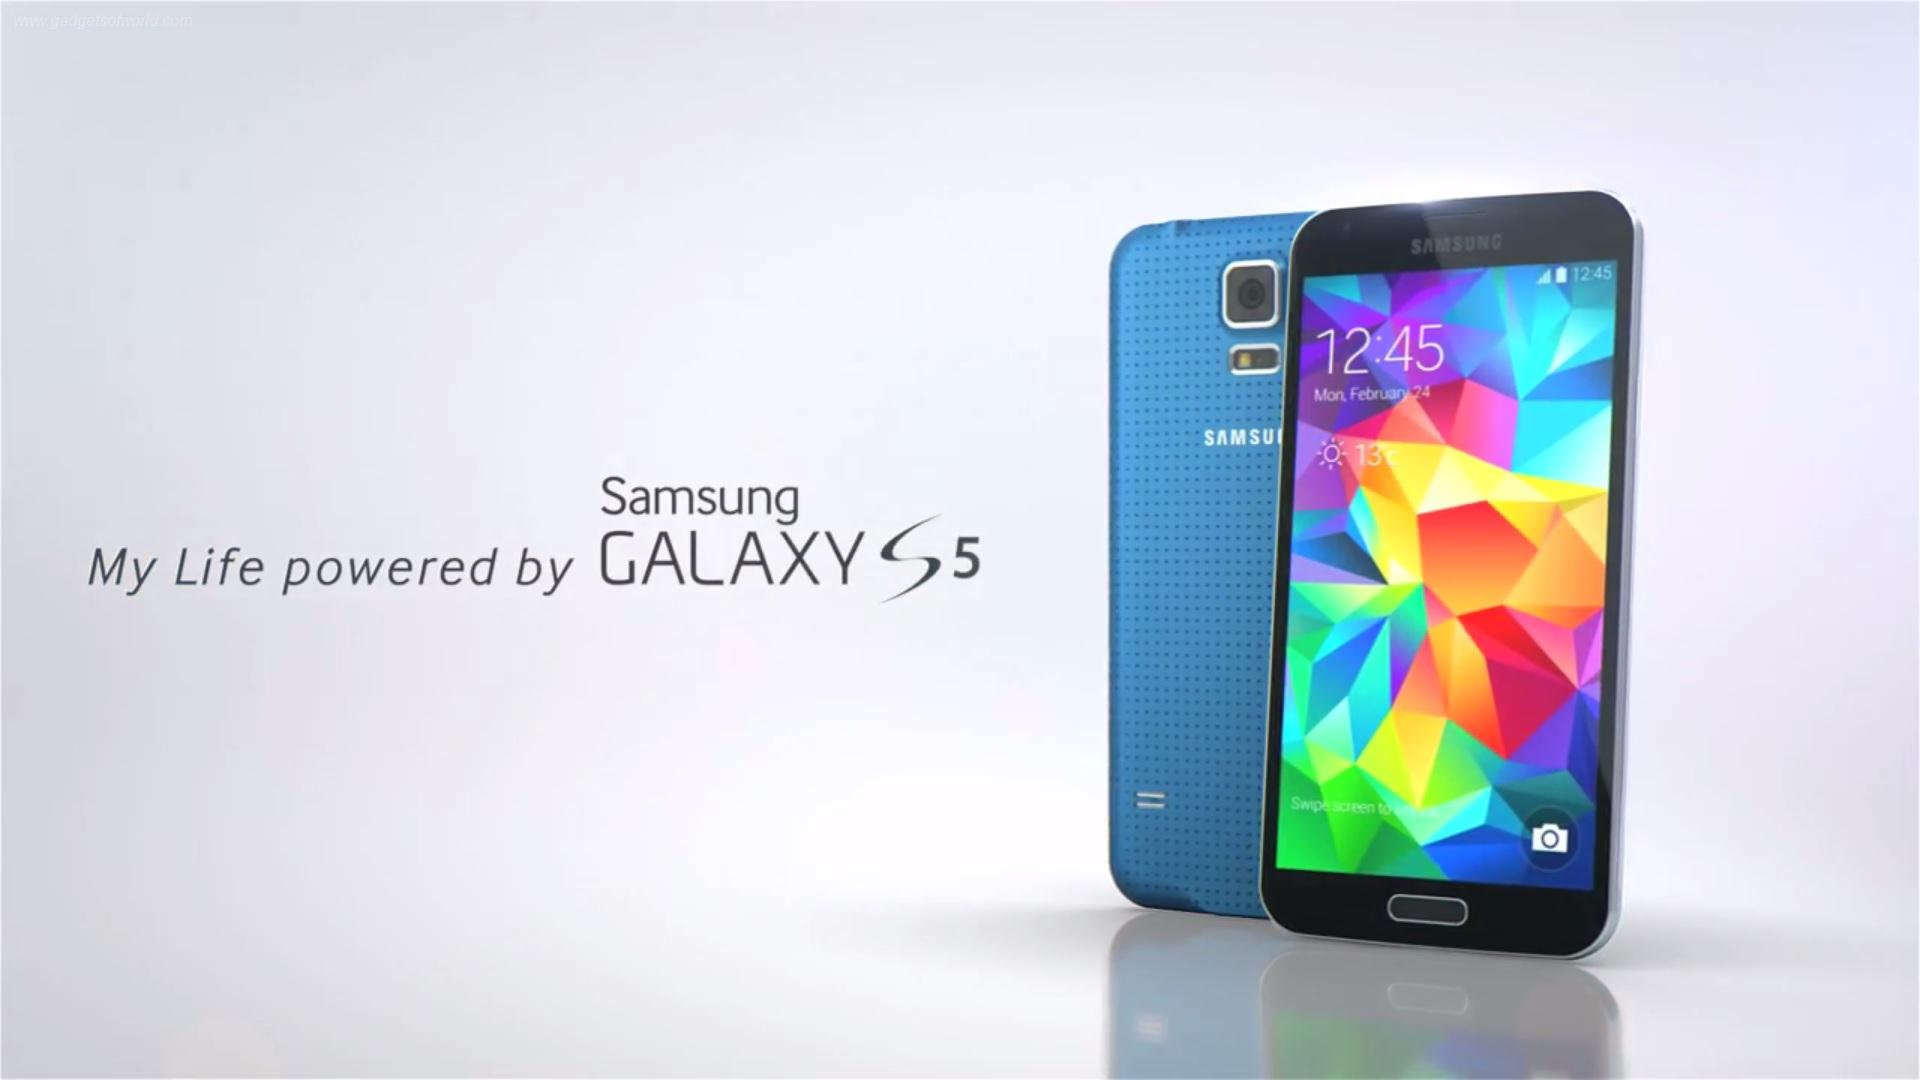 samsung galay s5 cele mai bune telefoane cu android